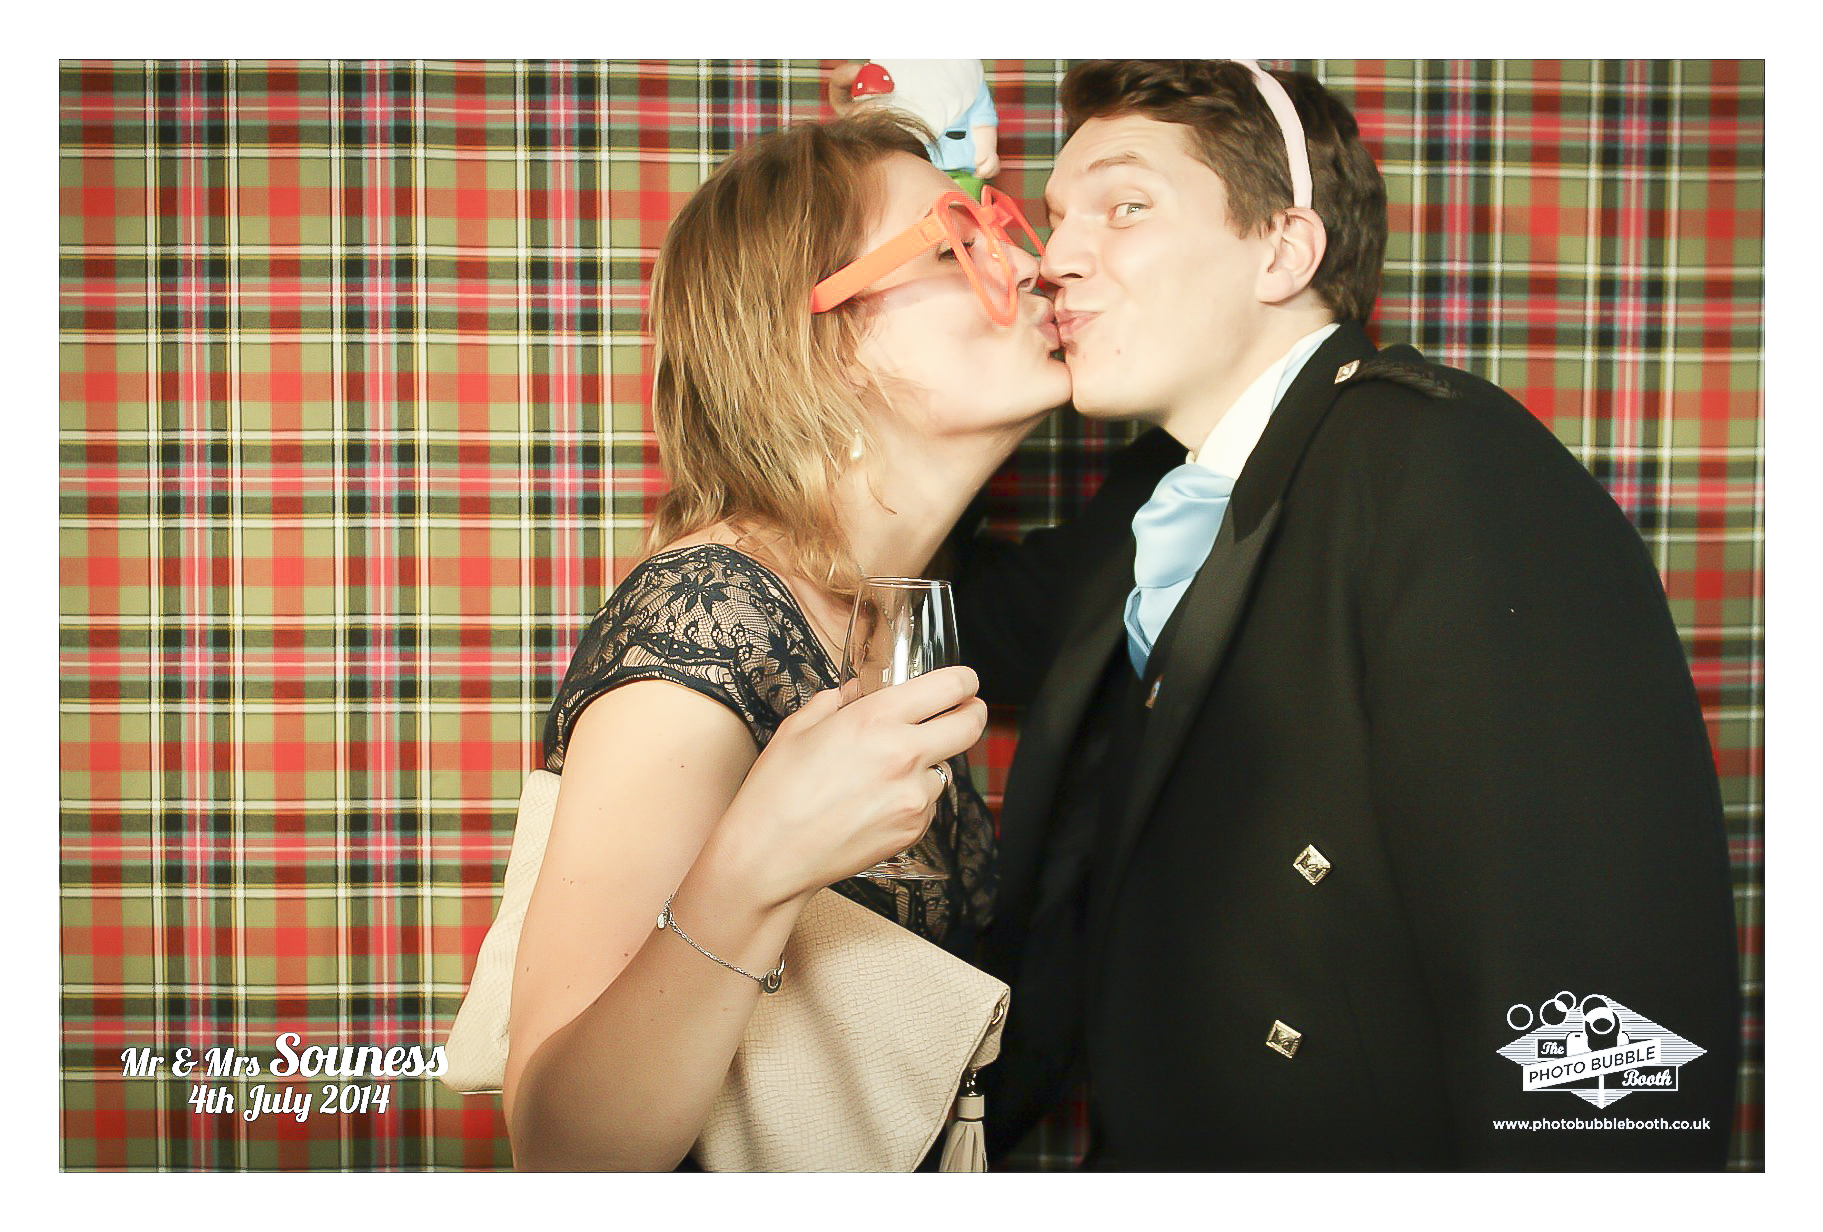 Neil & Trish Photobubble Booth_5.JPG